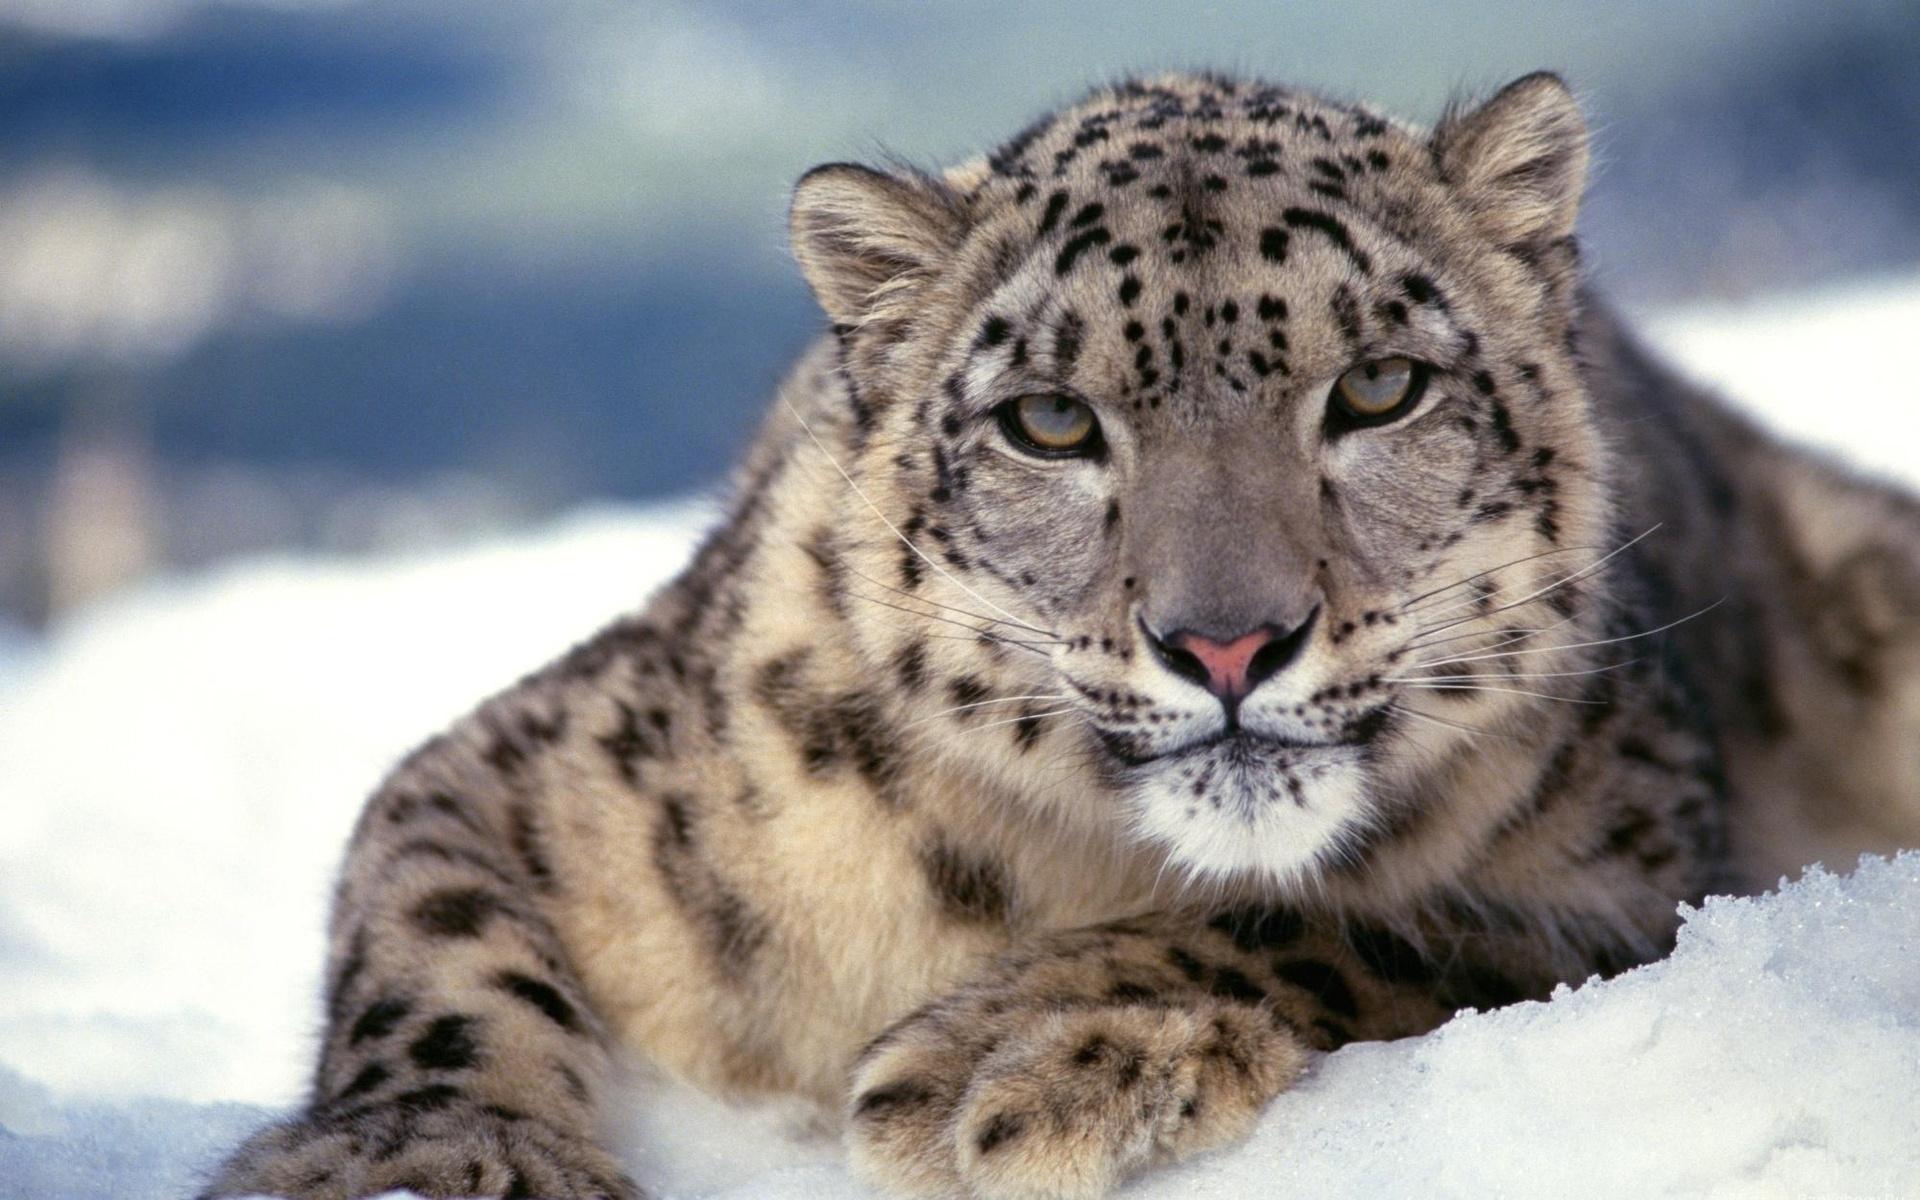 Drawn snow leopard baby Carrie Wallpaper Drawn HTML WallpaperSafari